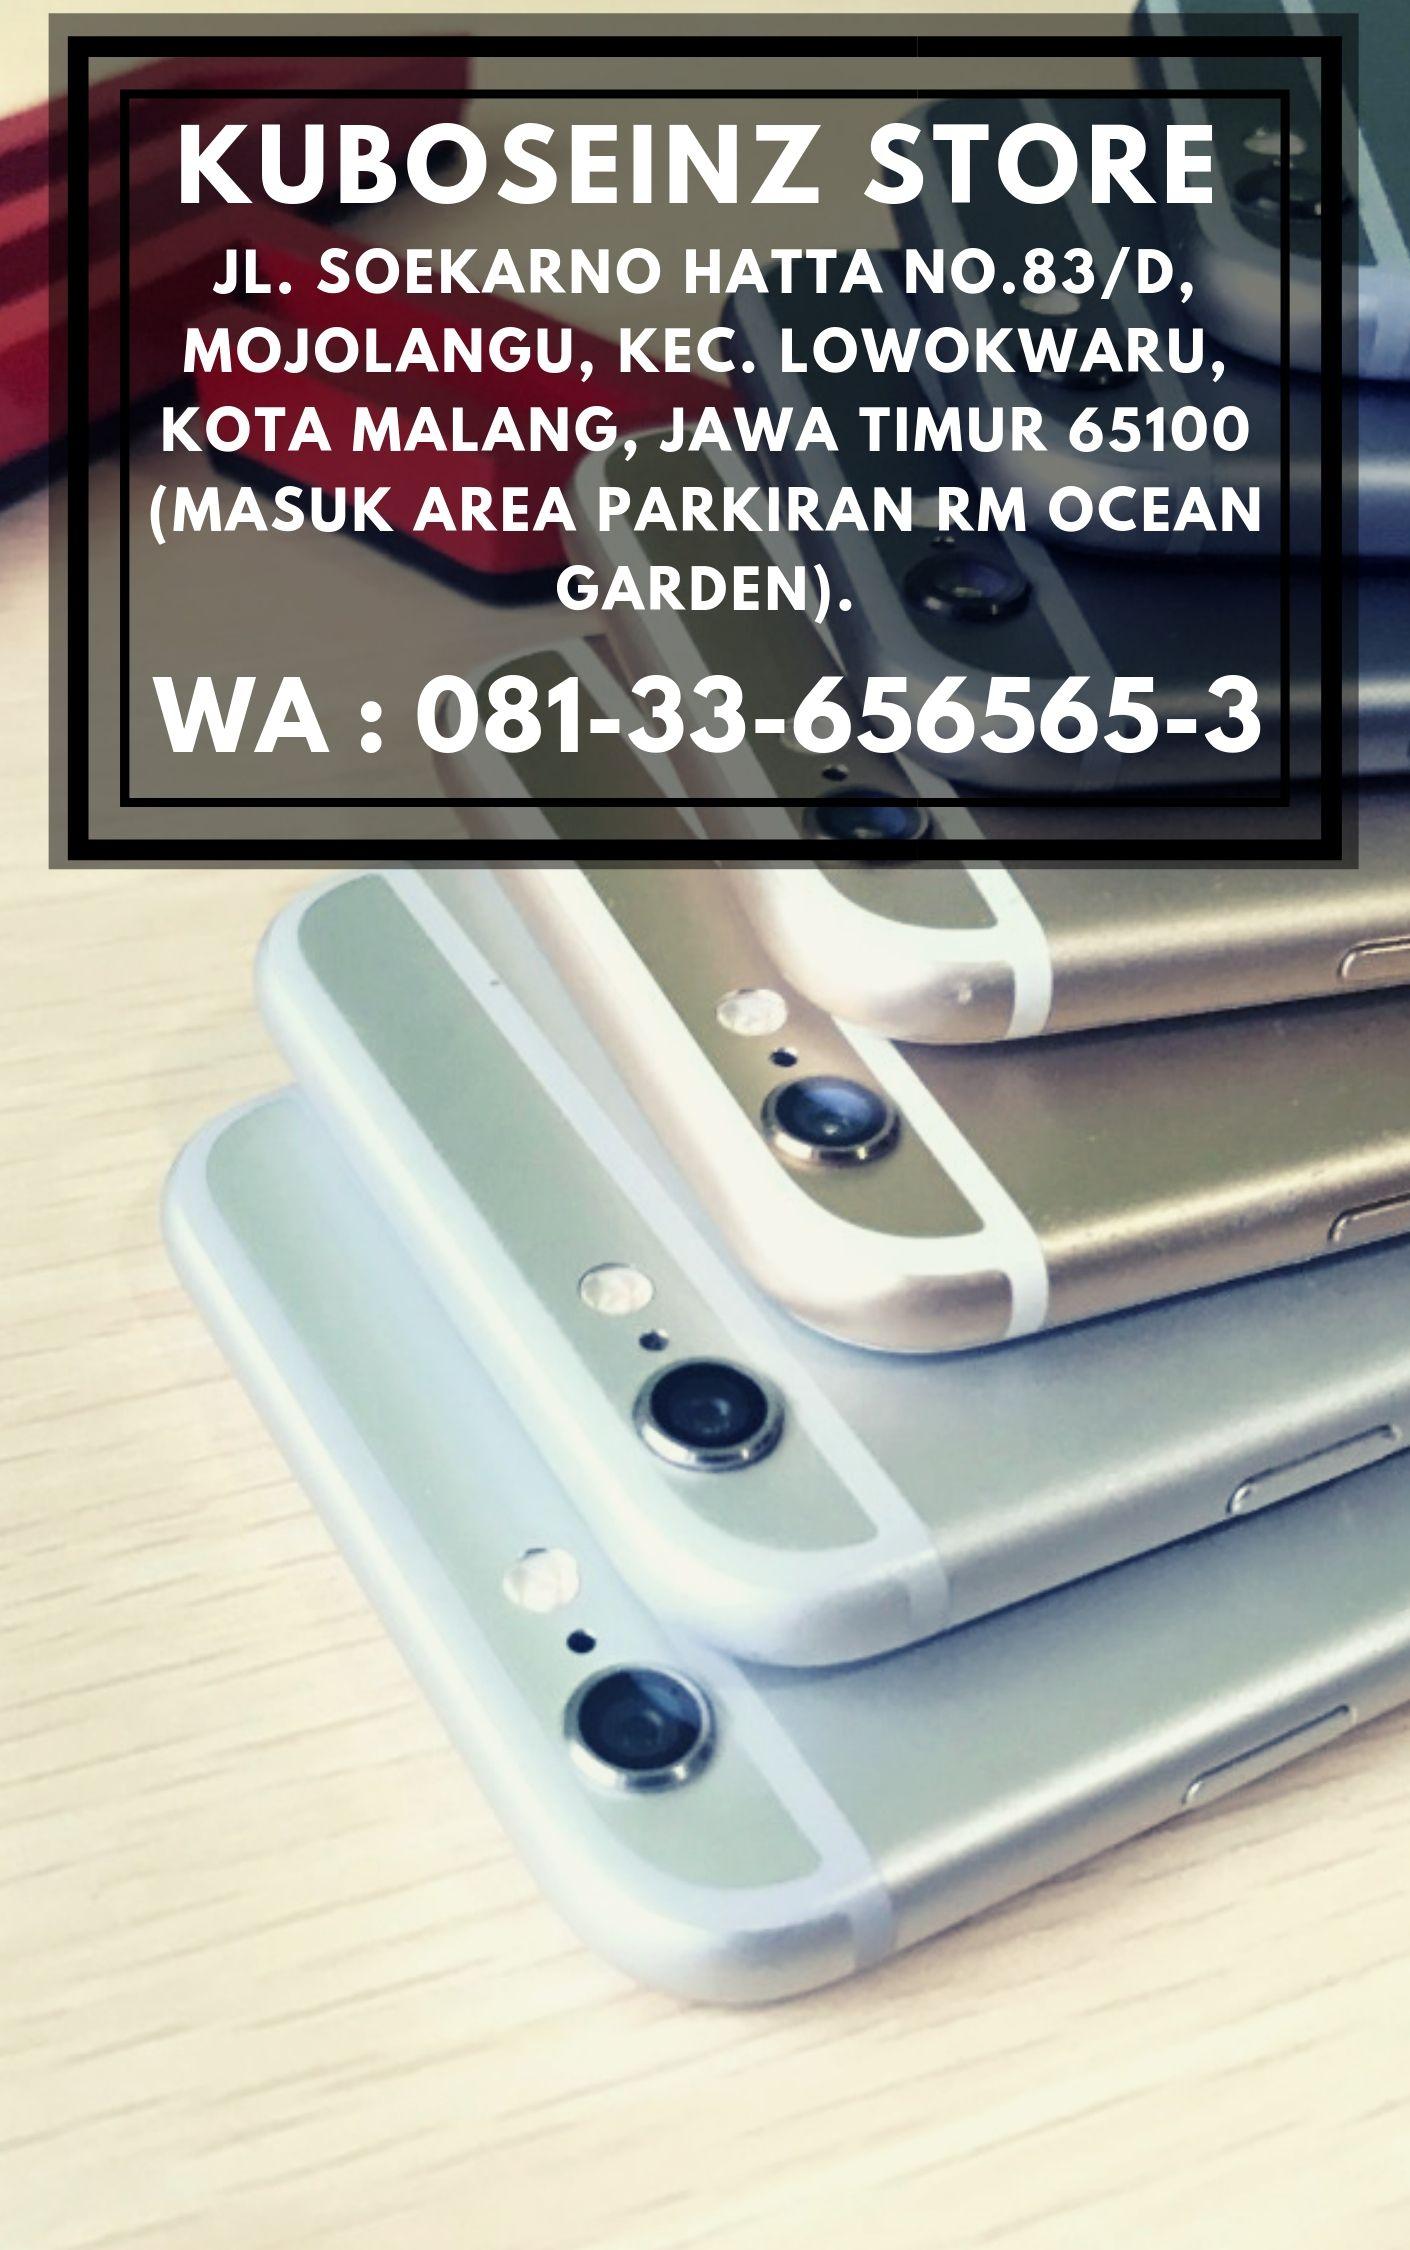 Kuboseinz Toko Gadget Handphone Alamat Jl Soekarno Hatta No 83